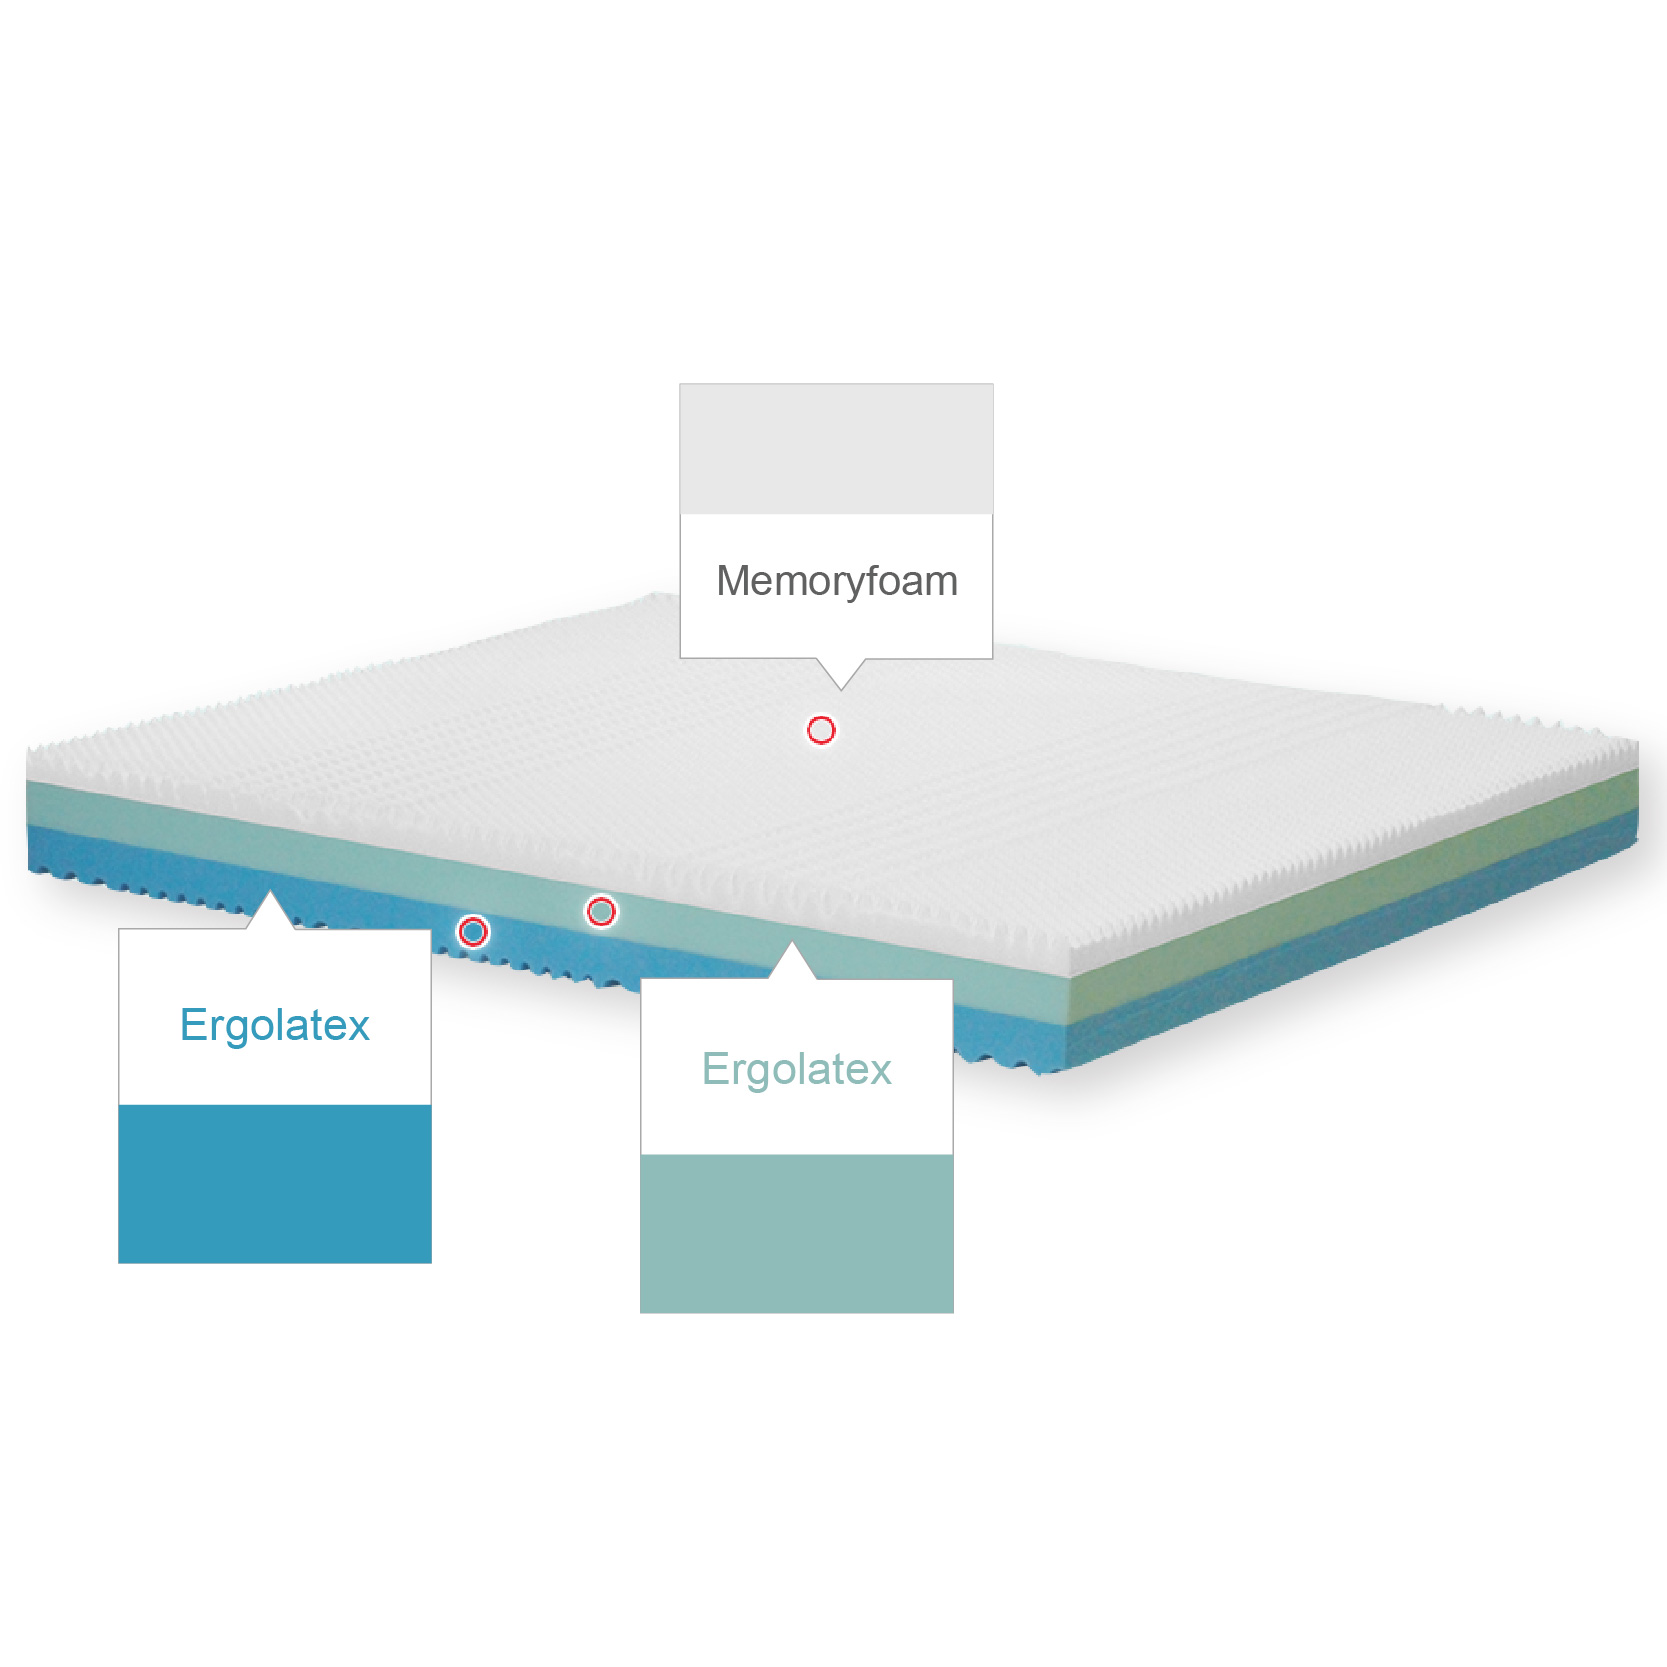 I Materassi Memory Foam.Memory Foam Mattress 3 Layers Height Cm 24 Supplies For Hotels B